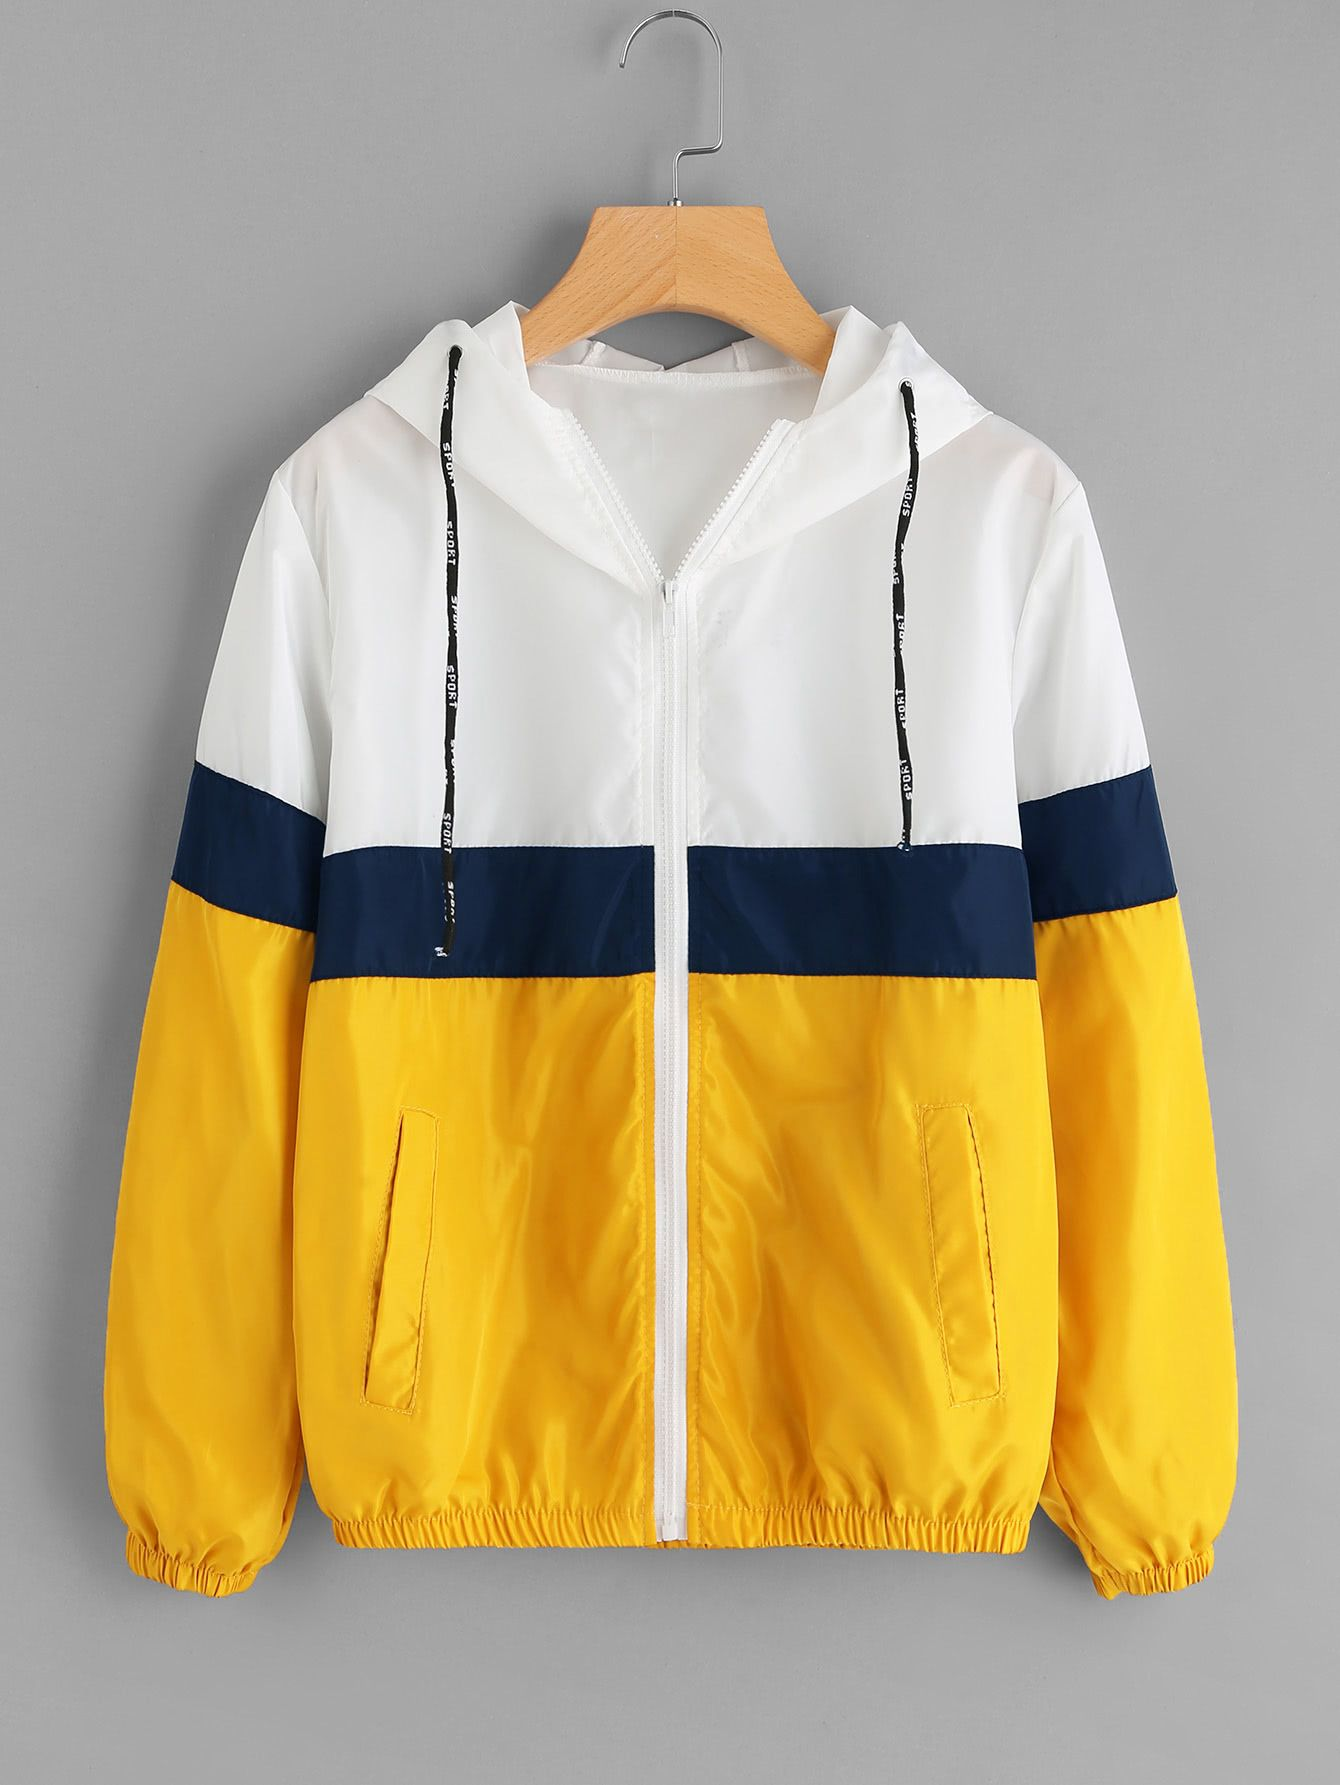 38de12cefe0395 Shop Color Block Elastic Waist Drawstring Jacket online. SheIn offers Color  Block Elastic Waist Drawstring Jacket & more to fit your fashionable needs.